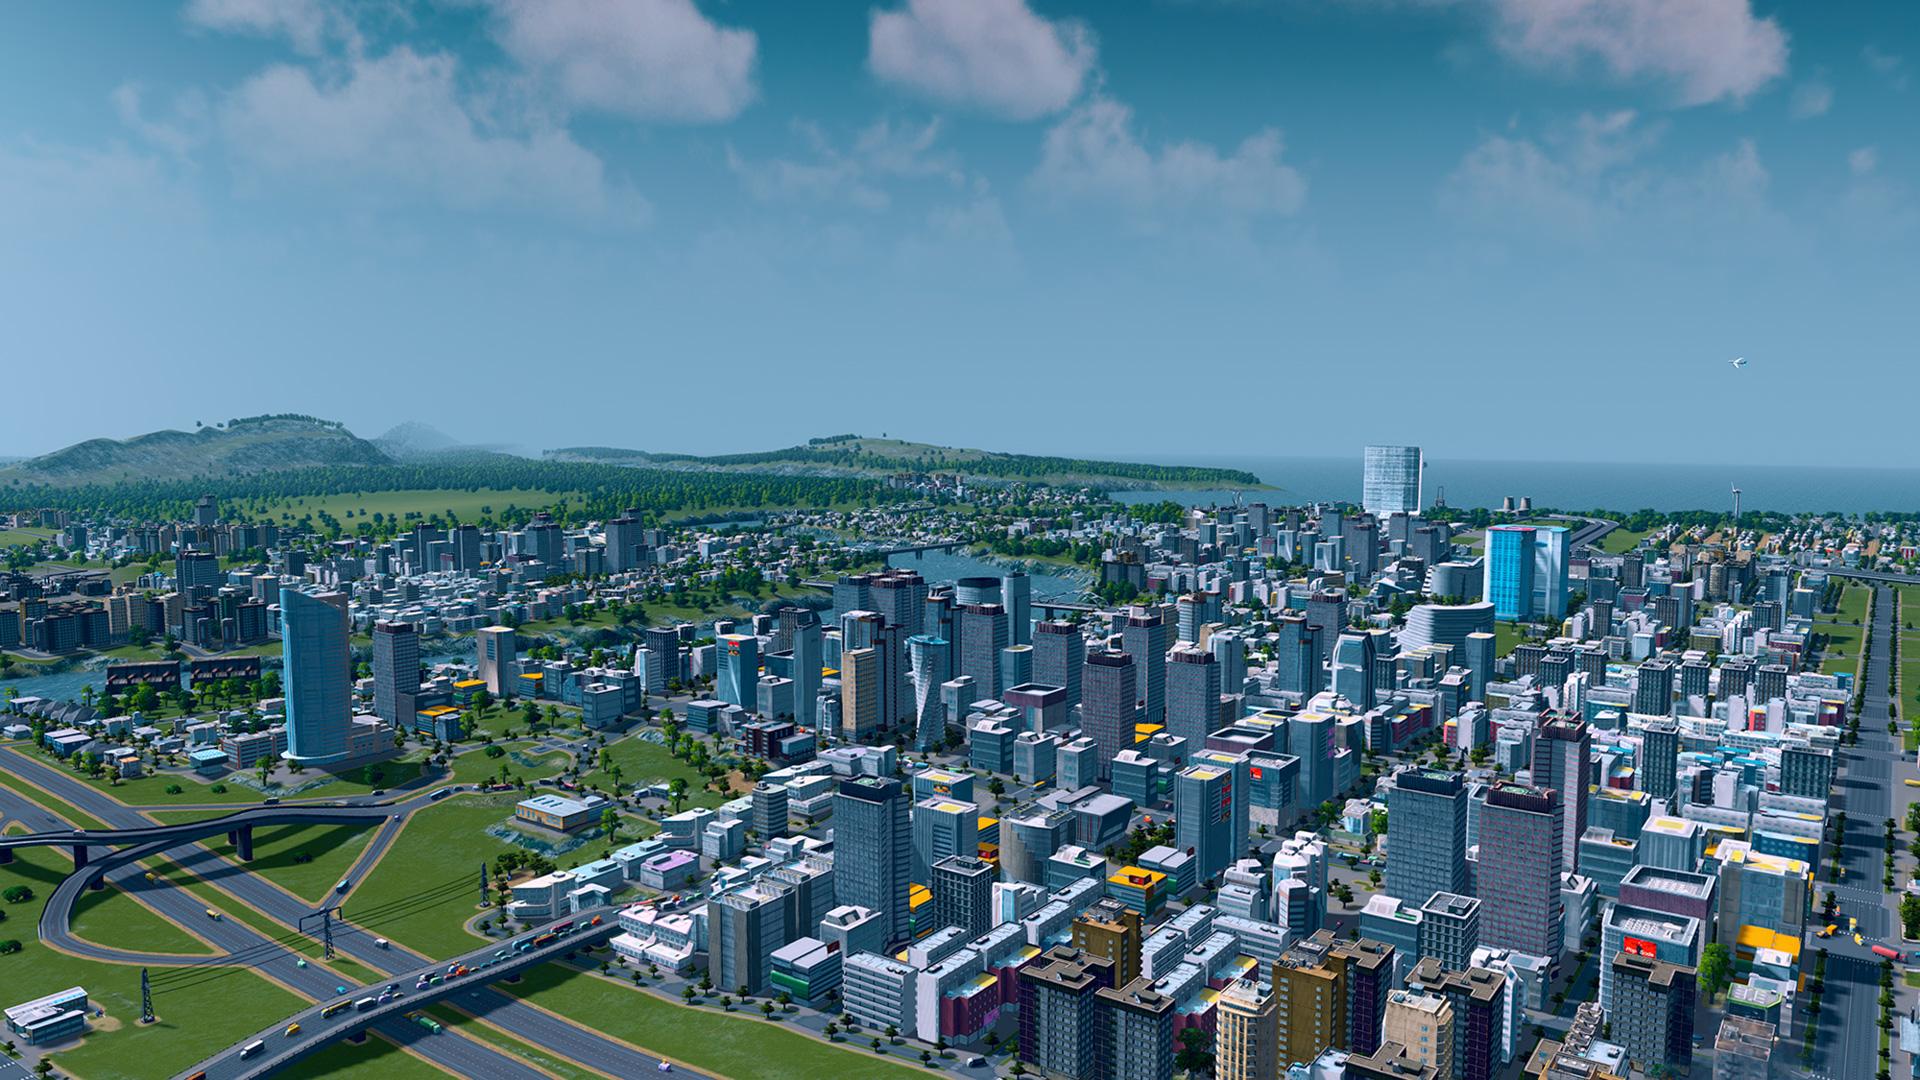 http://www.idgtv.es/archivos/201803/cities-skylines-img1.jpg